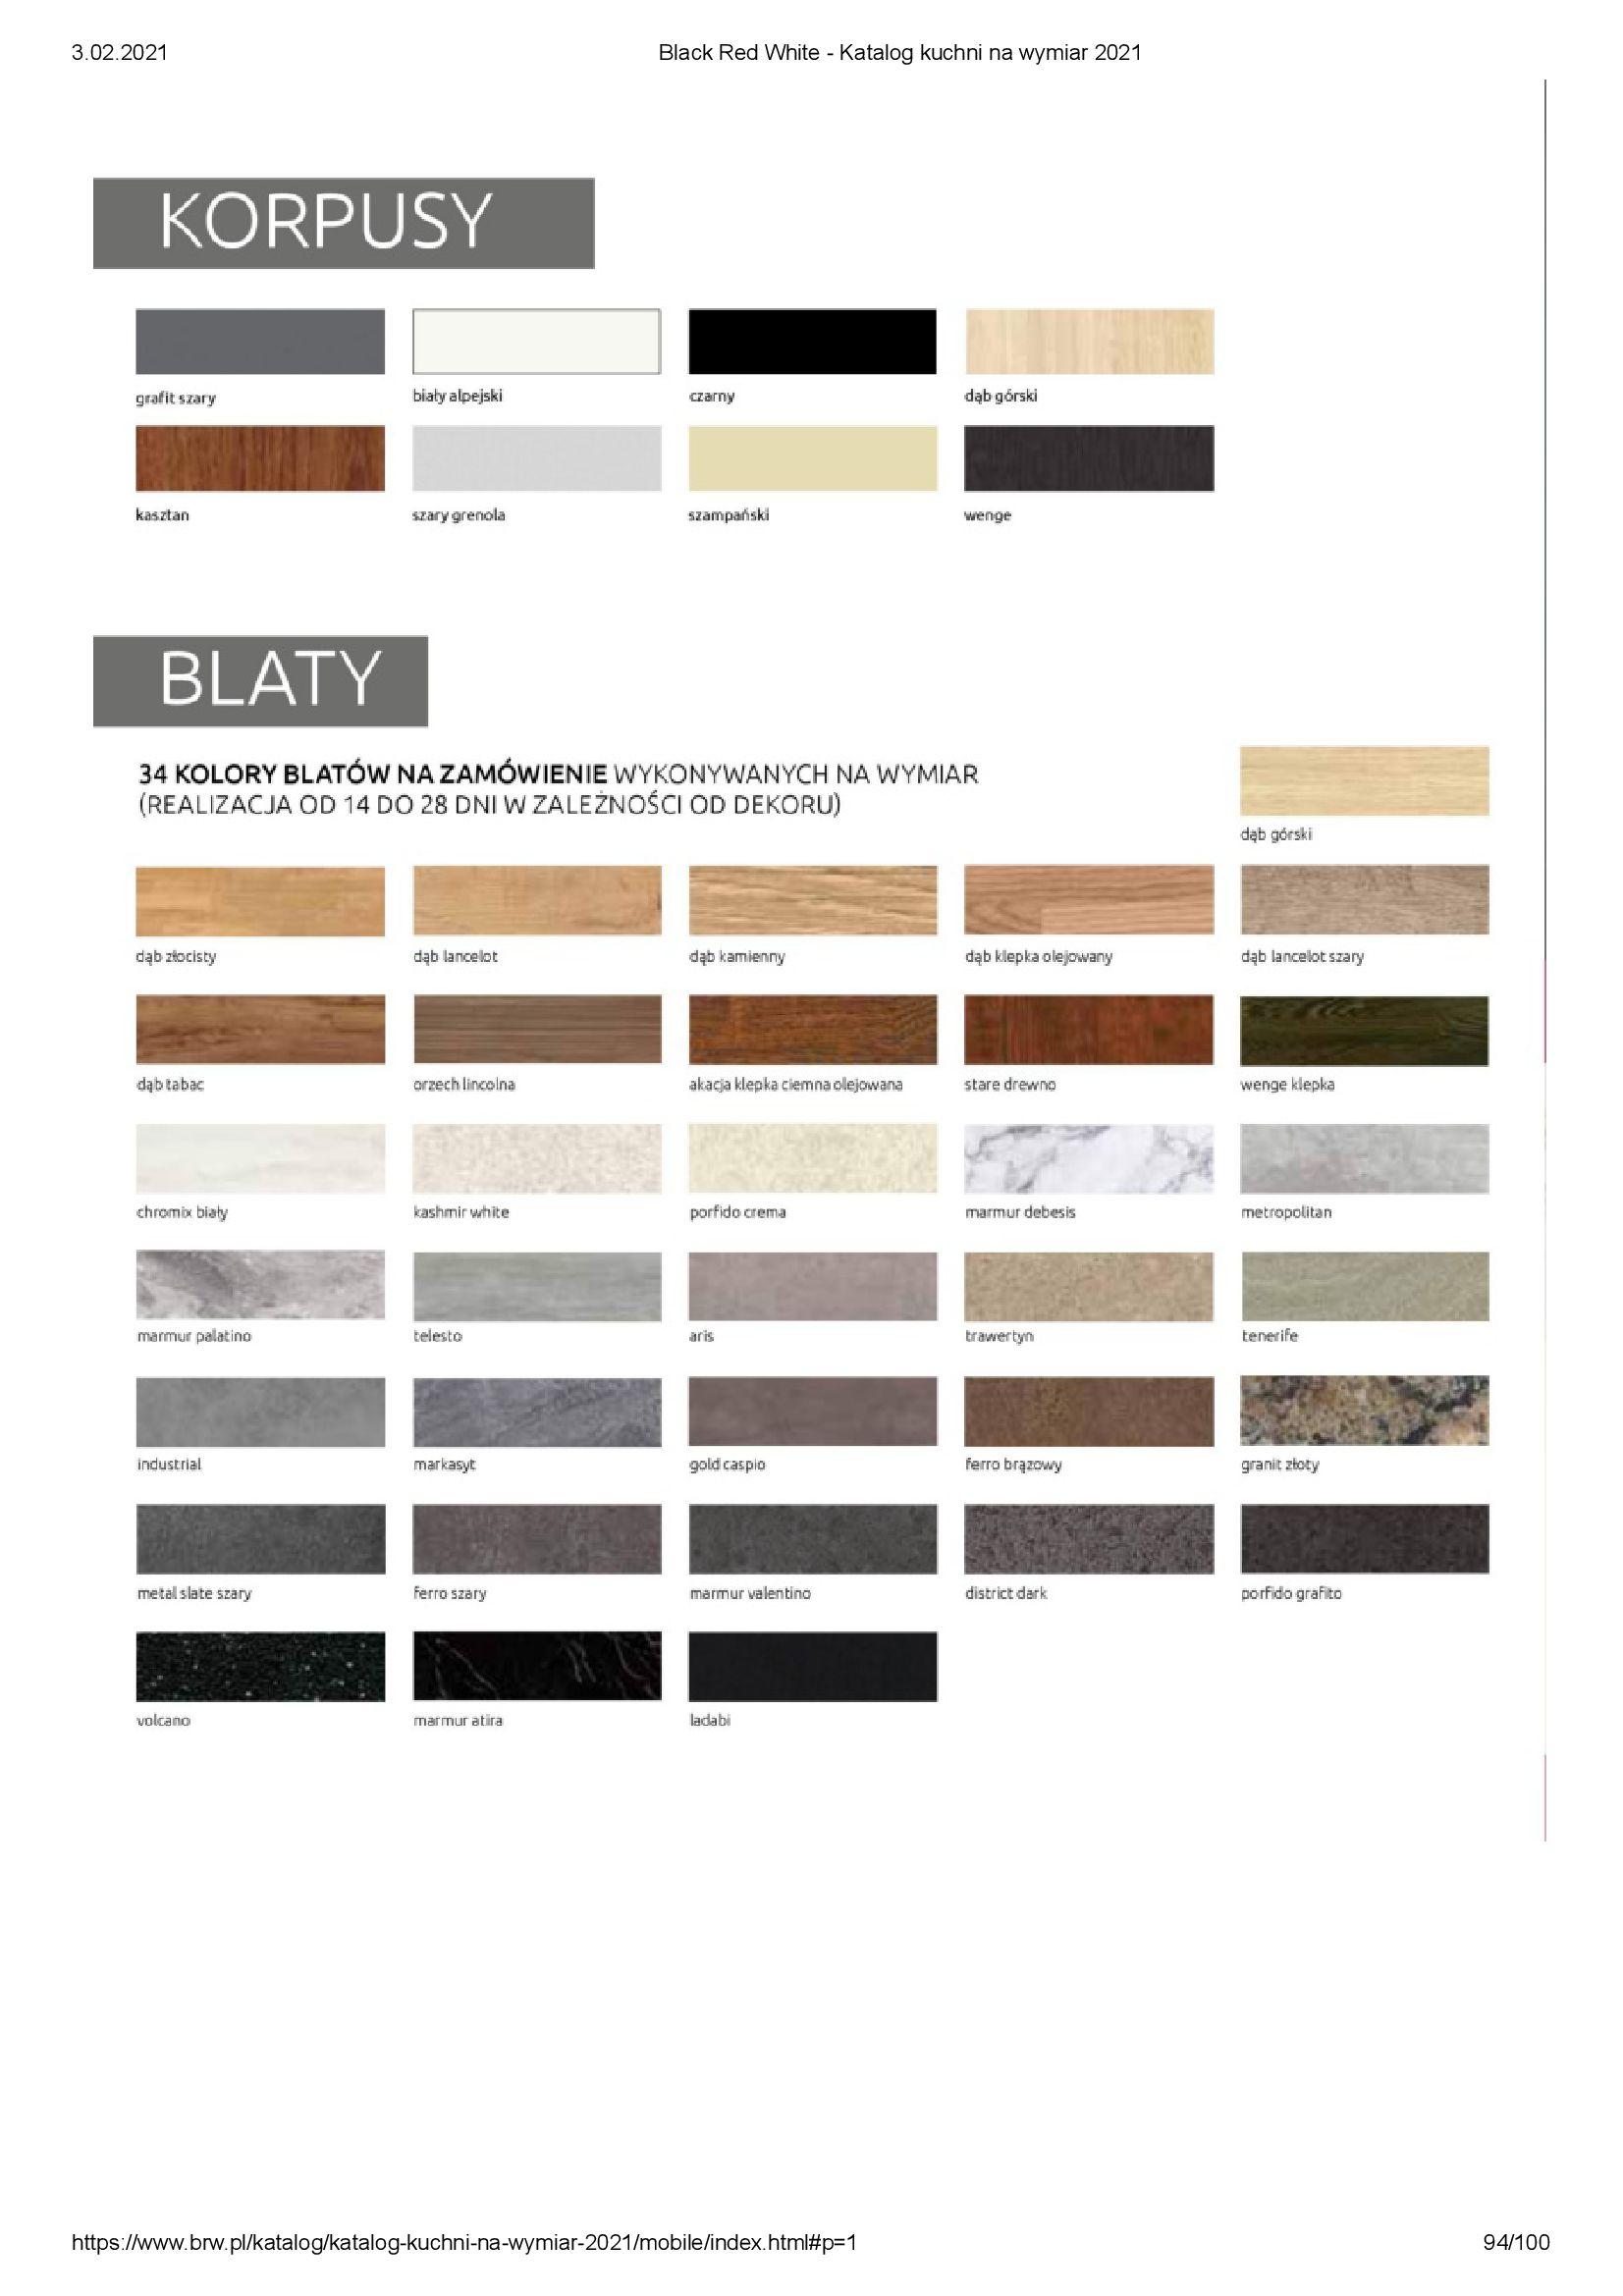 Gazetka Black Red White: Katalog - Kuchnie na wymiar Senso Kitchens 2021 2021-01-01 page-94